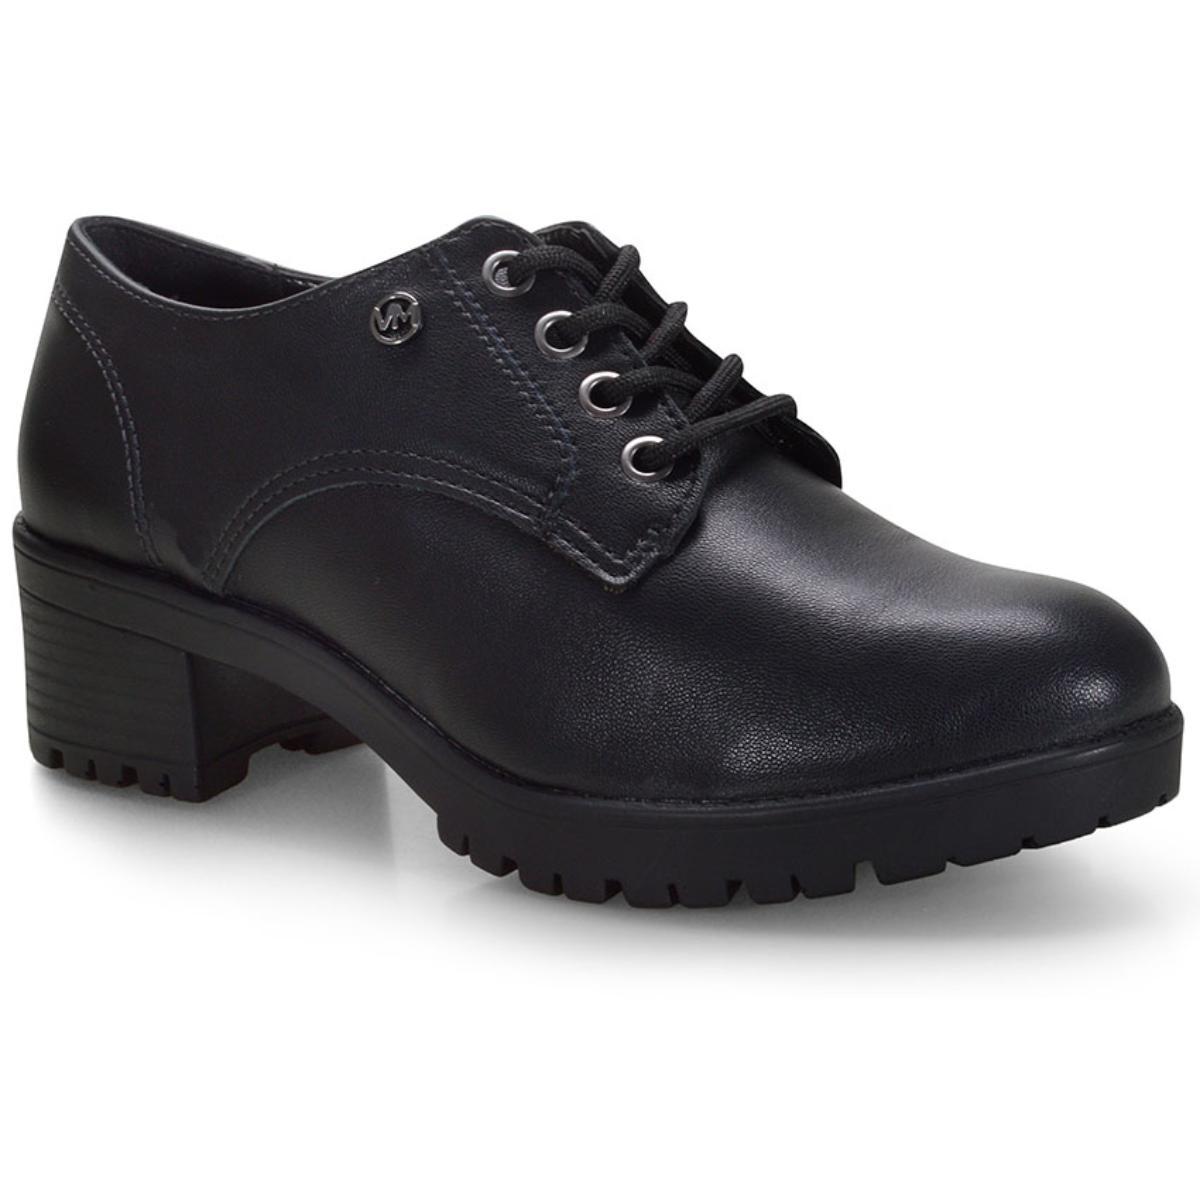 Sapato Feminino Via Marte 20-8006 Preto